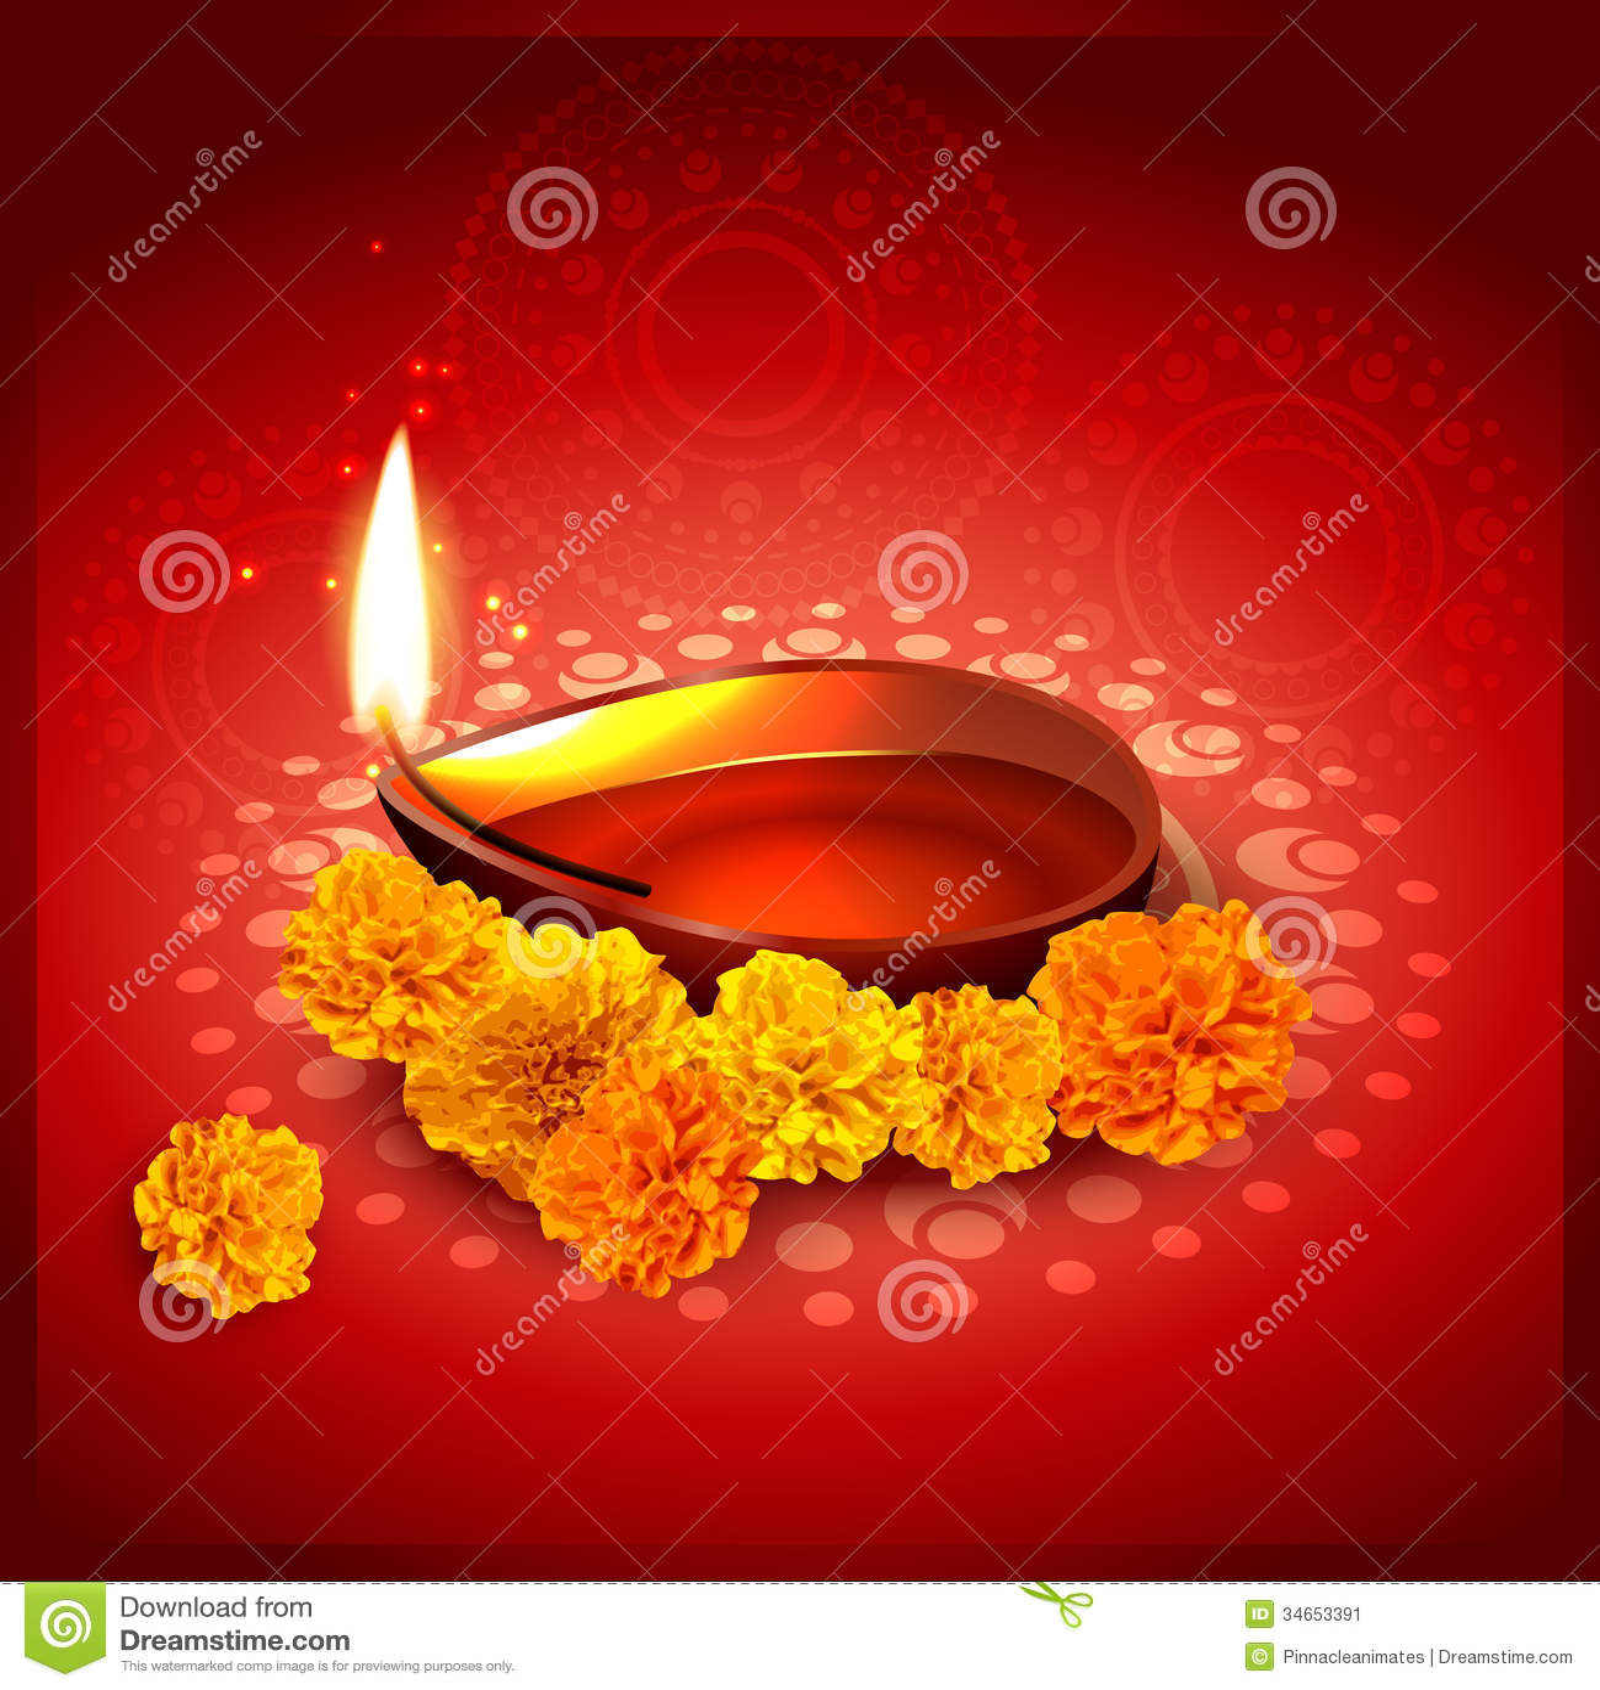 Vector diwali diya stock vector. Illustration of creative - 34653391 for diwali diya wallpaper vector  45ifm